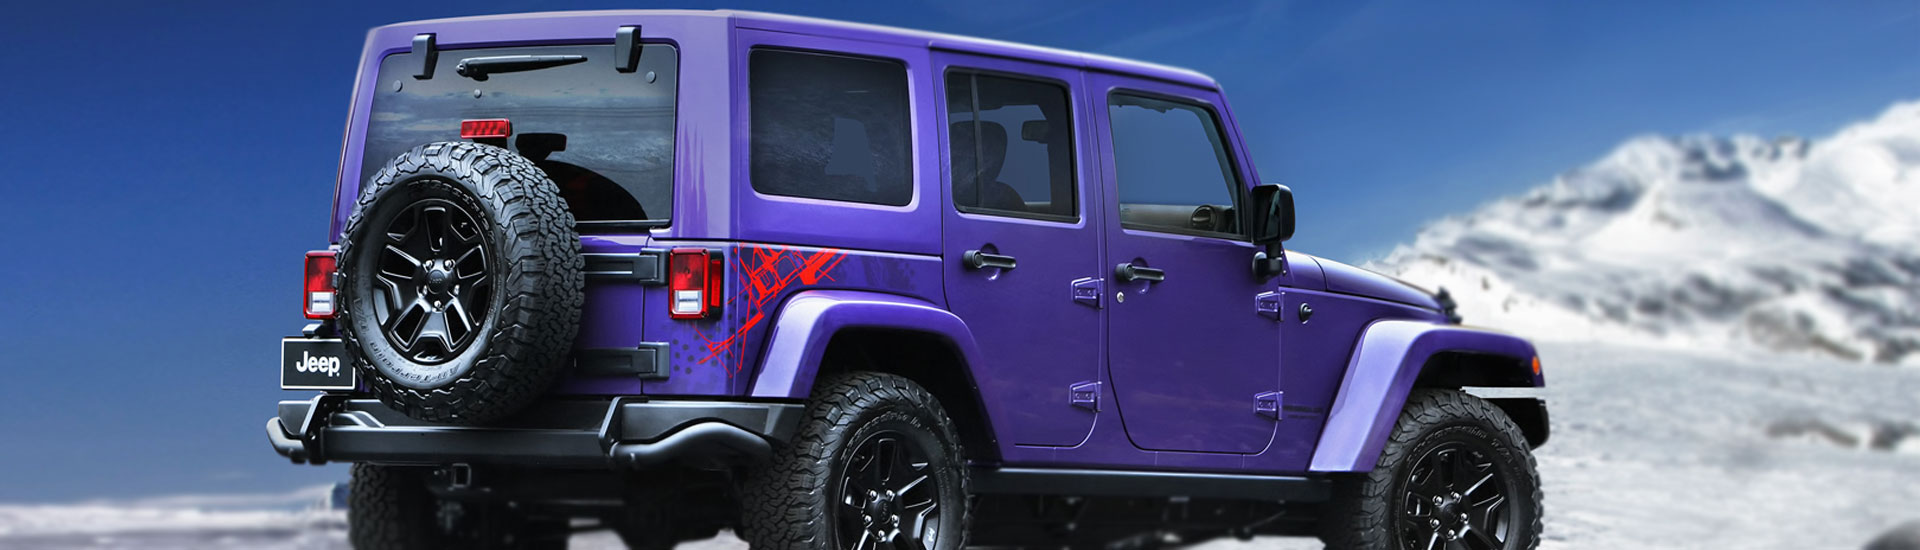 Jeep Window Tint Kit Diy Precut